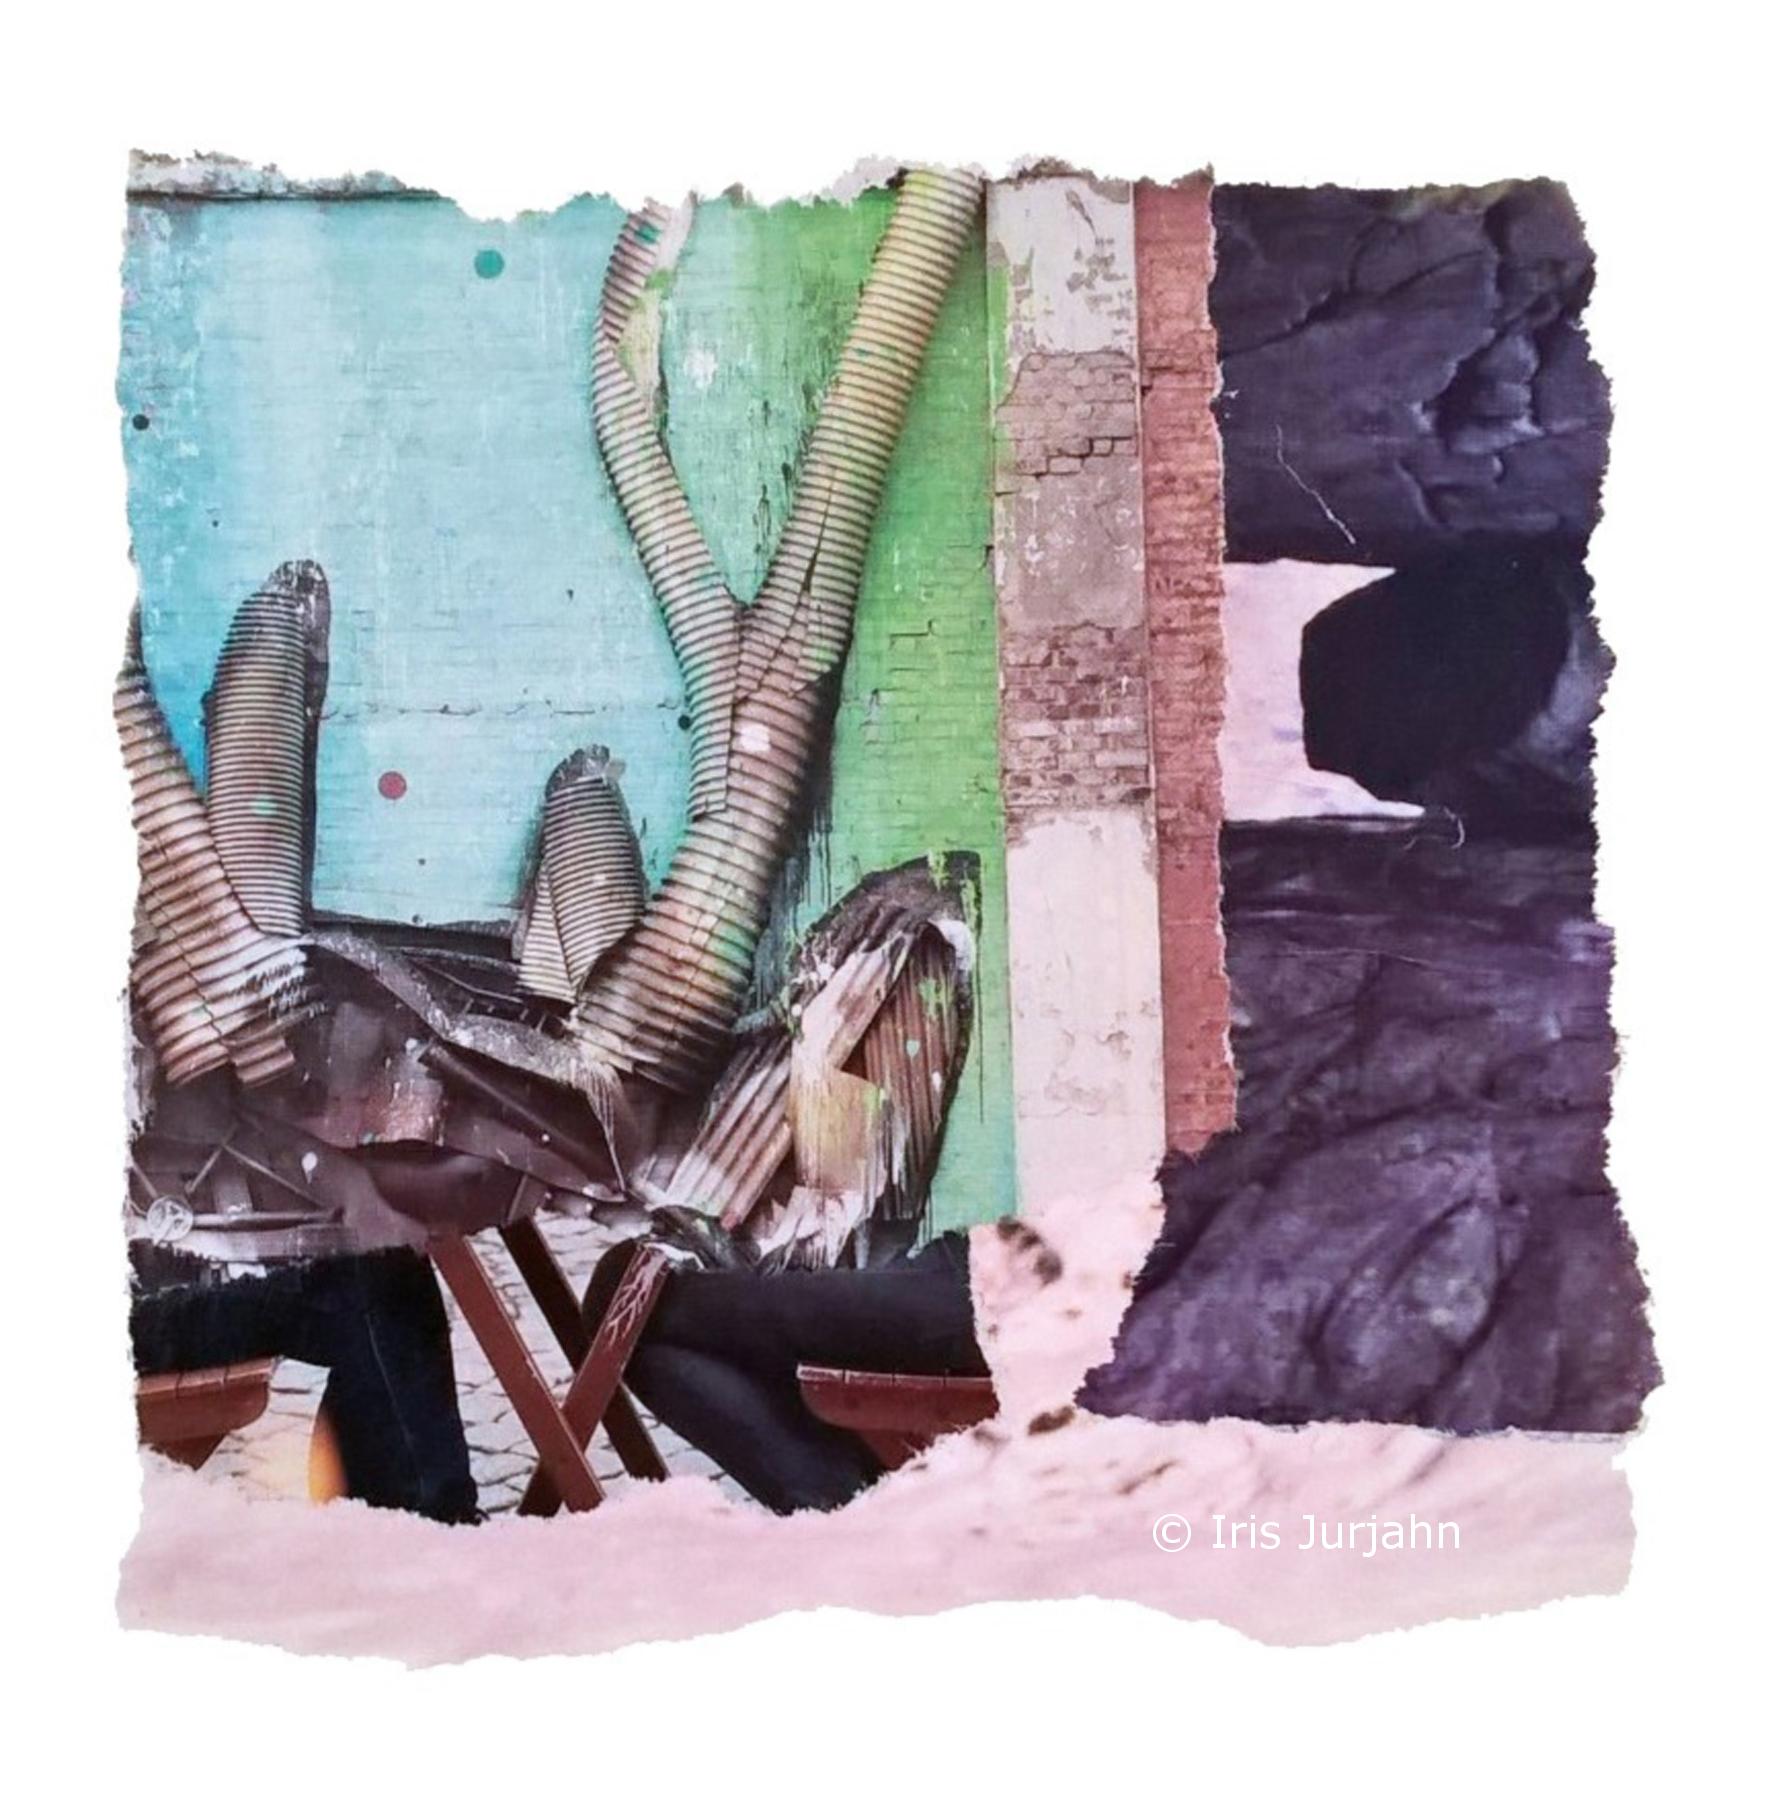 My deer, Papiercollage, 17,5 x 17,5 cm, 2017, sold / verkauft